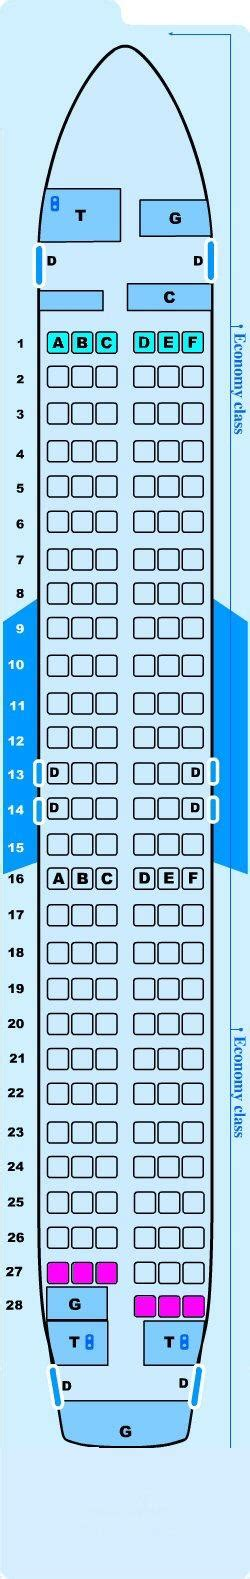 plan des sieges airbus a320 seat map lauda air airbus a320 214 seatmaestro